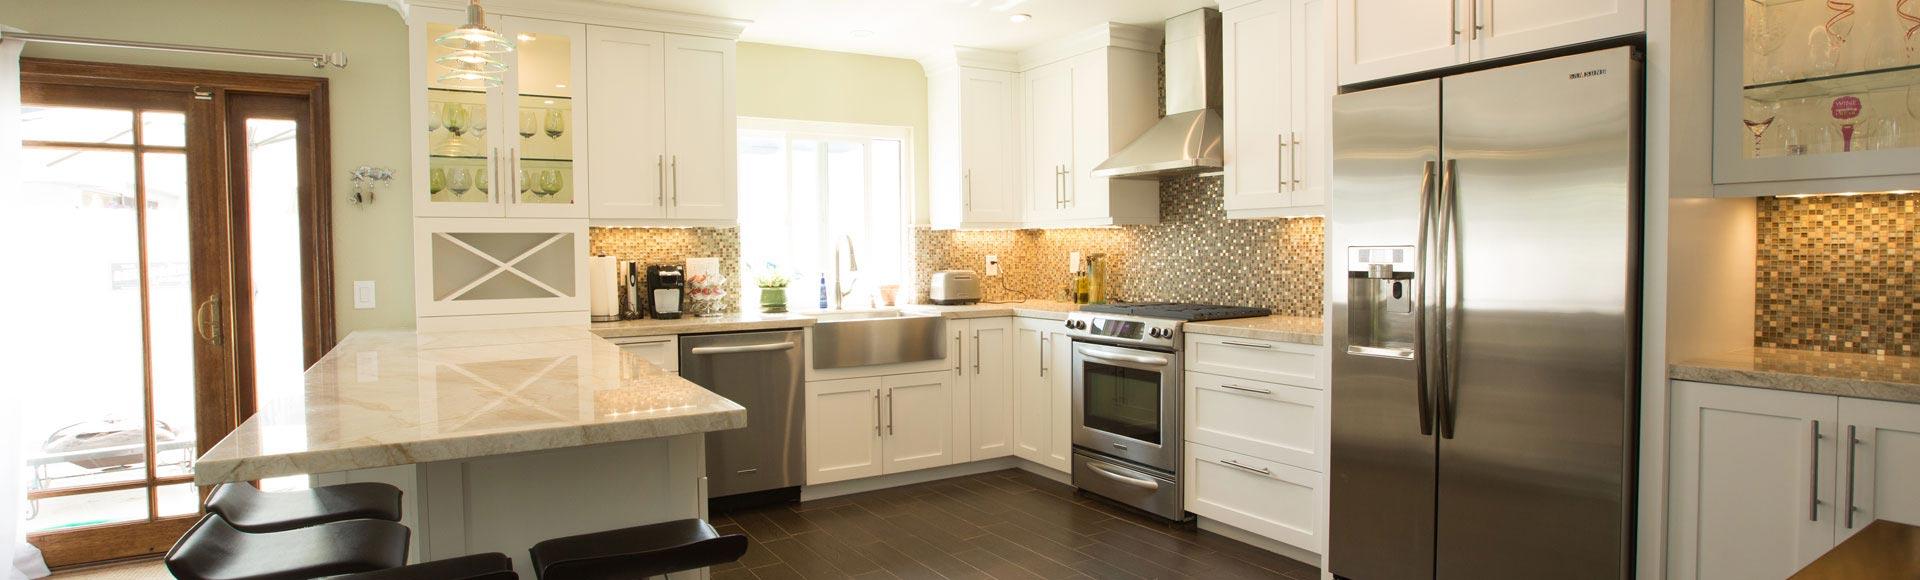 Framless-Euro-Style-White-Modern-Kitchen-Cabinets-AZ6A6576